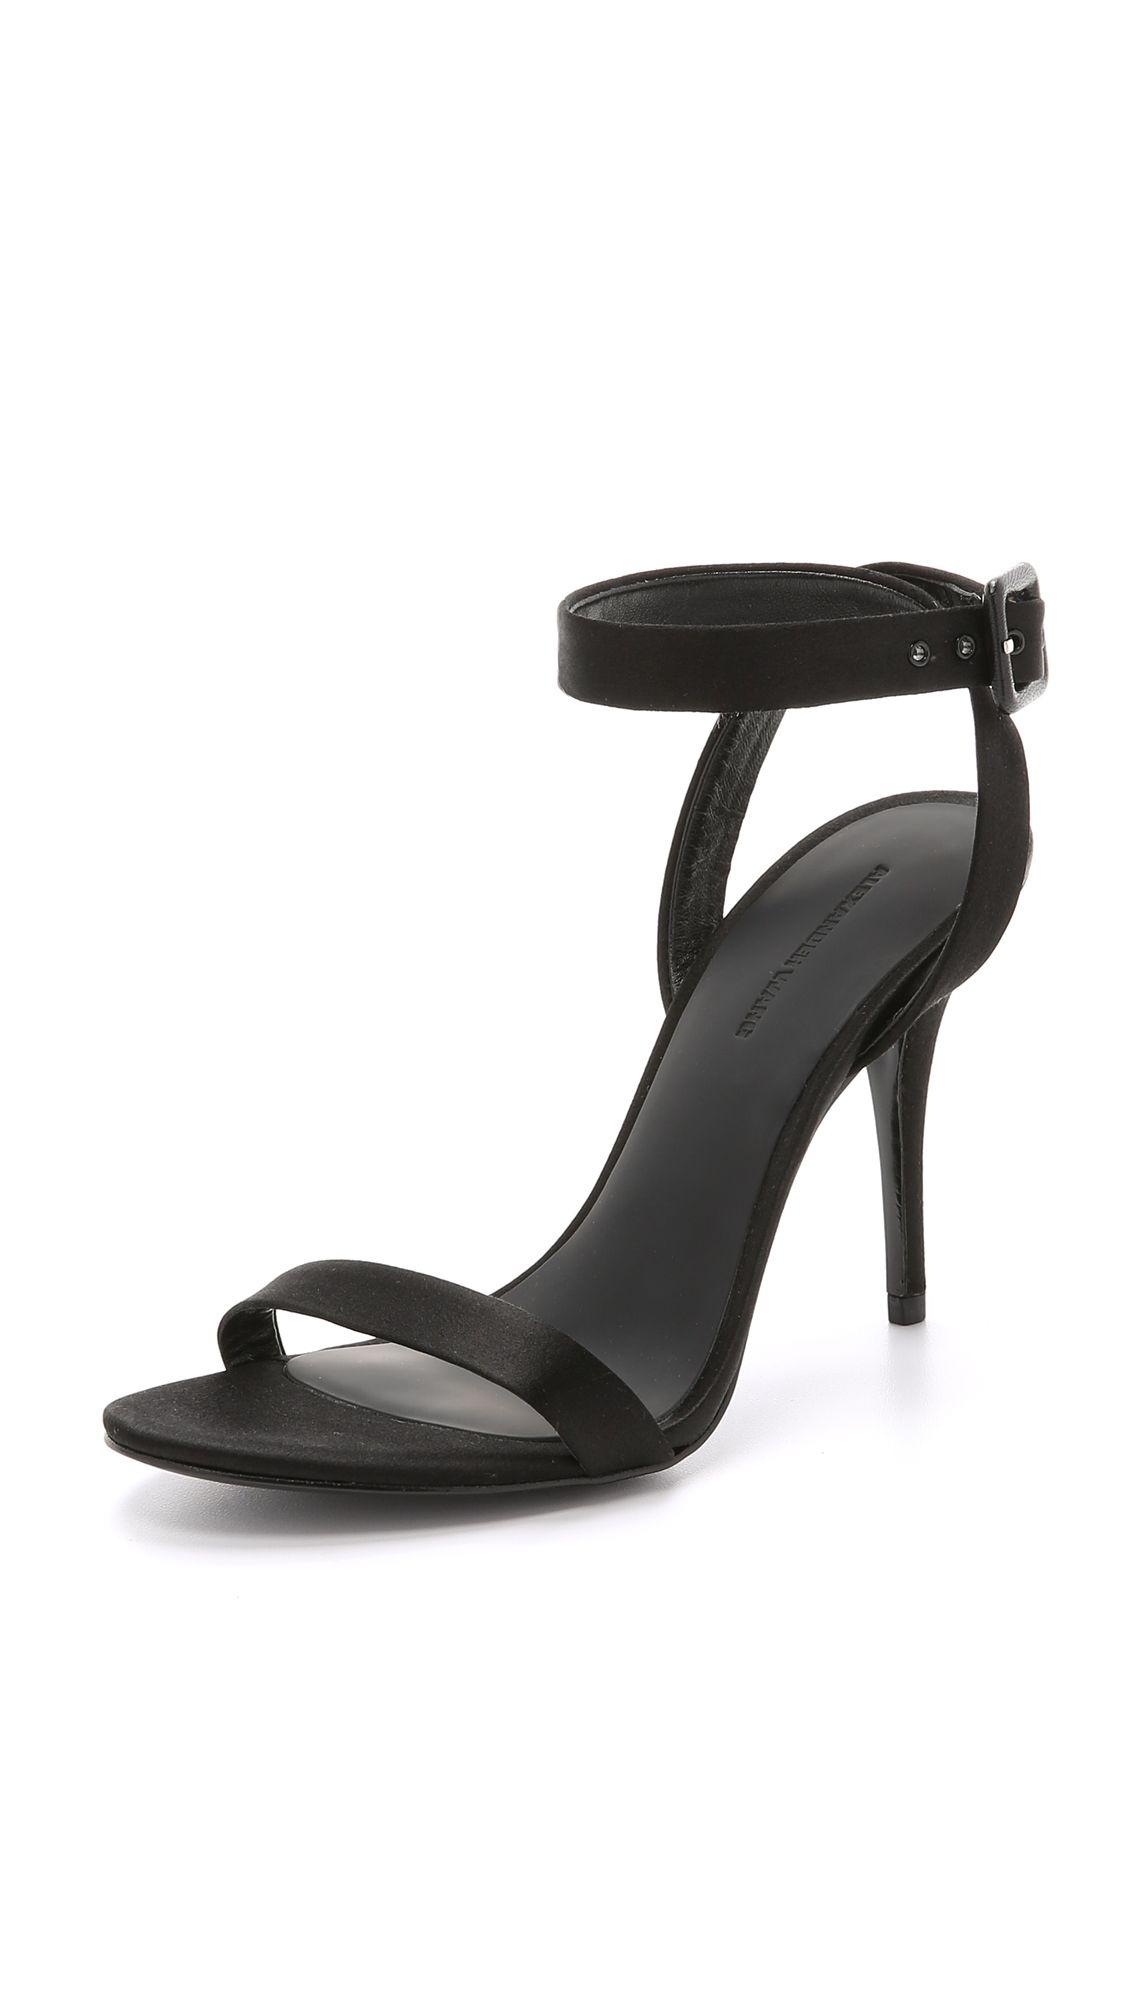 Alexander Wang Atalya High Heel Sandals - Black   SHOPBOP.COM saved by #ShoppingIS